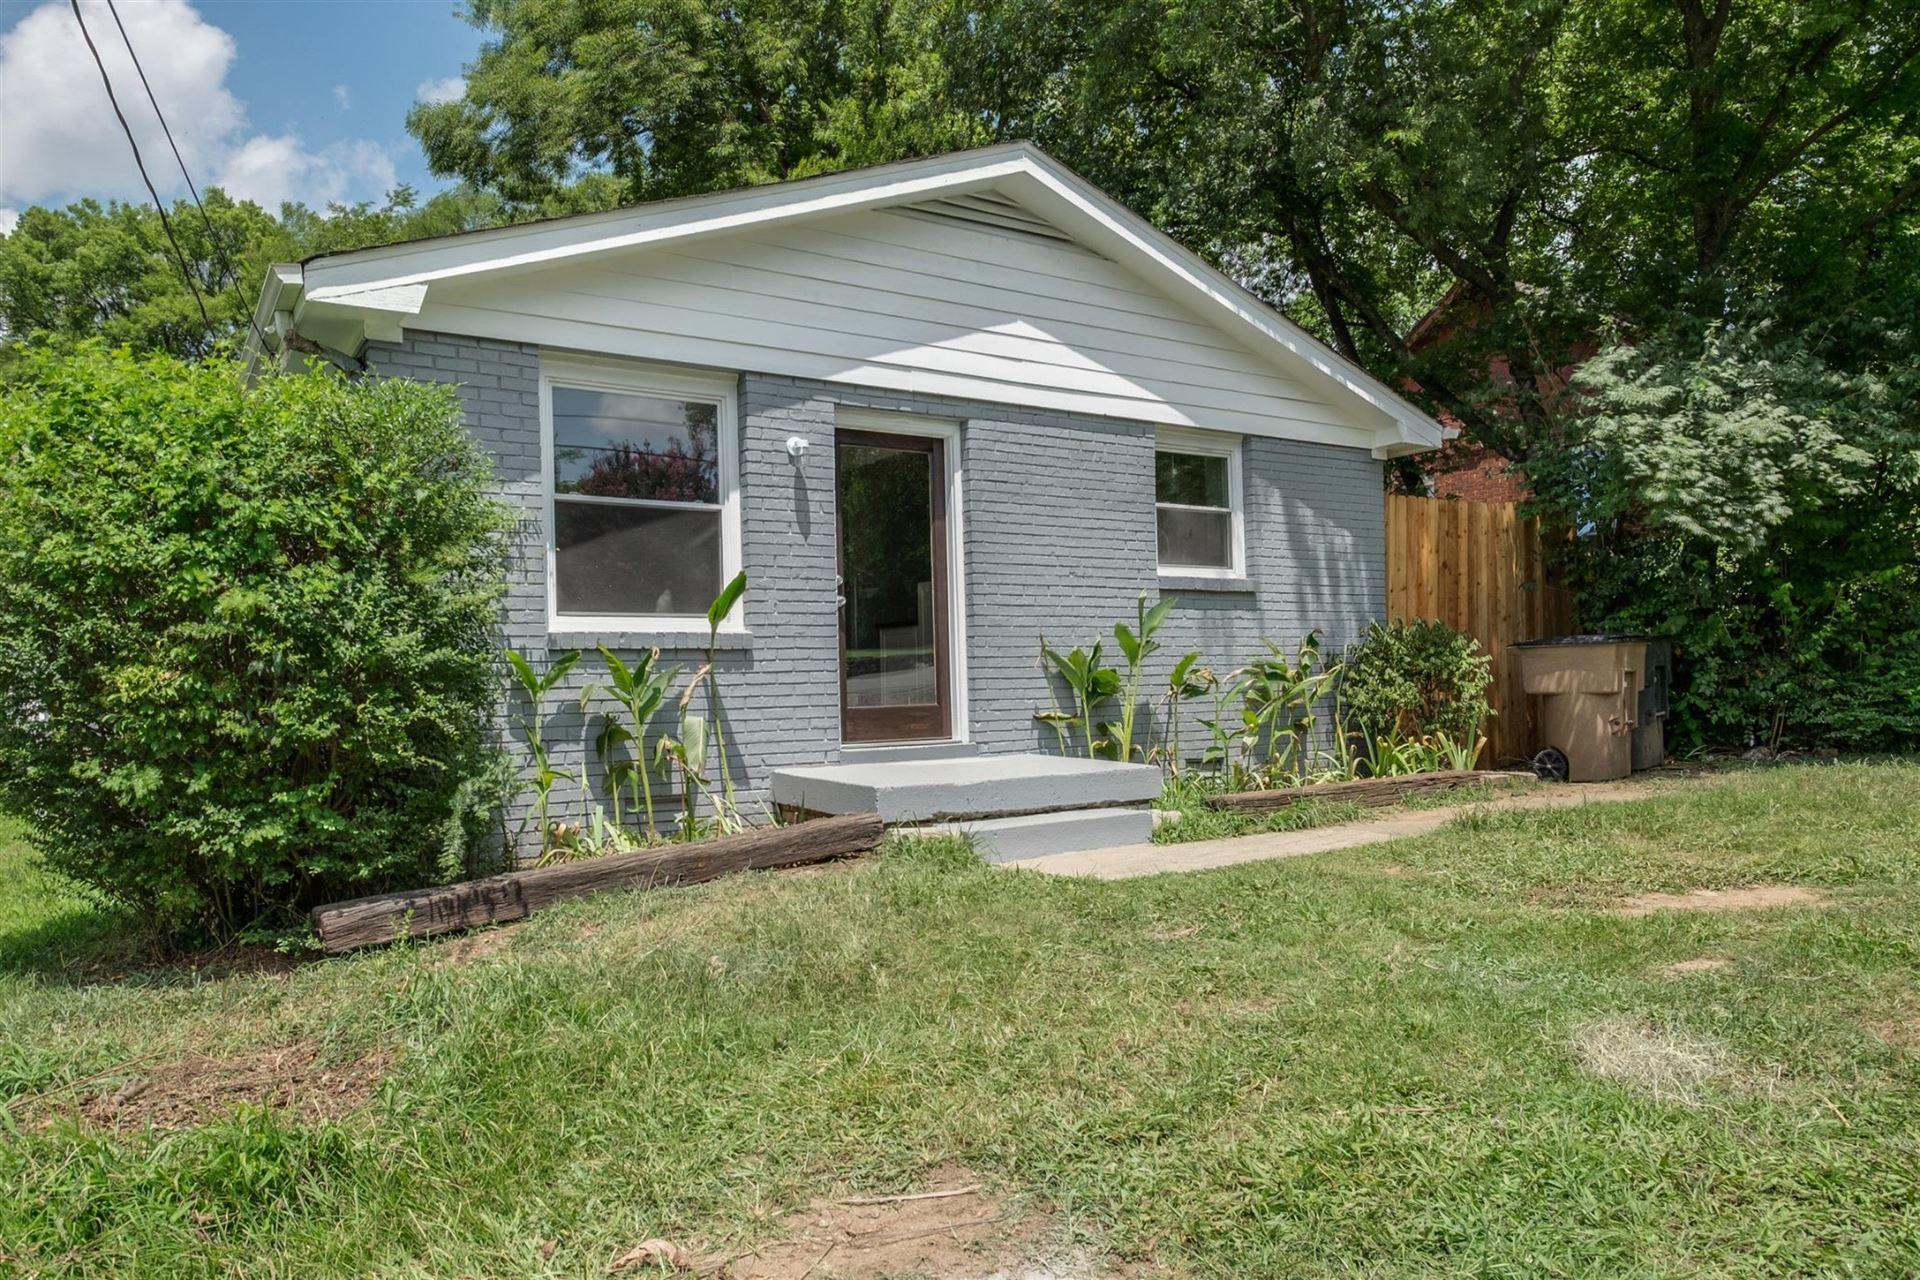 903B Maynor Ave, Nashville, TN 37216 - MLS#: 2220355